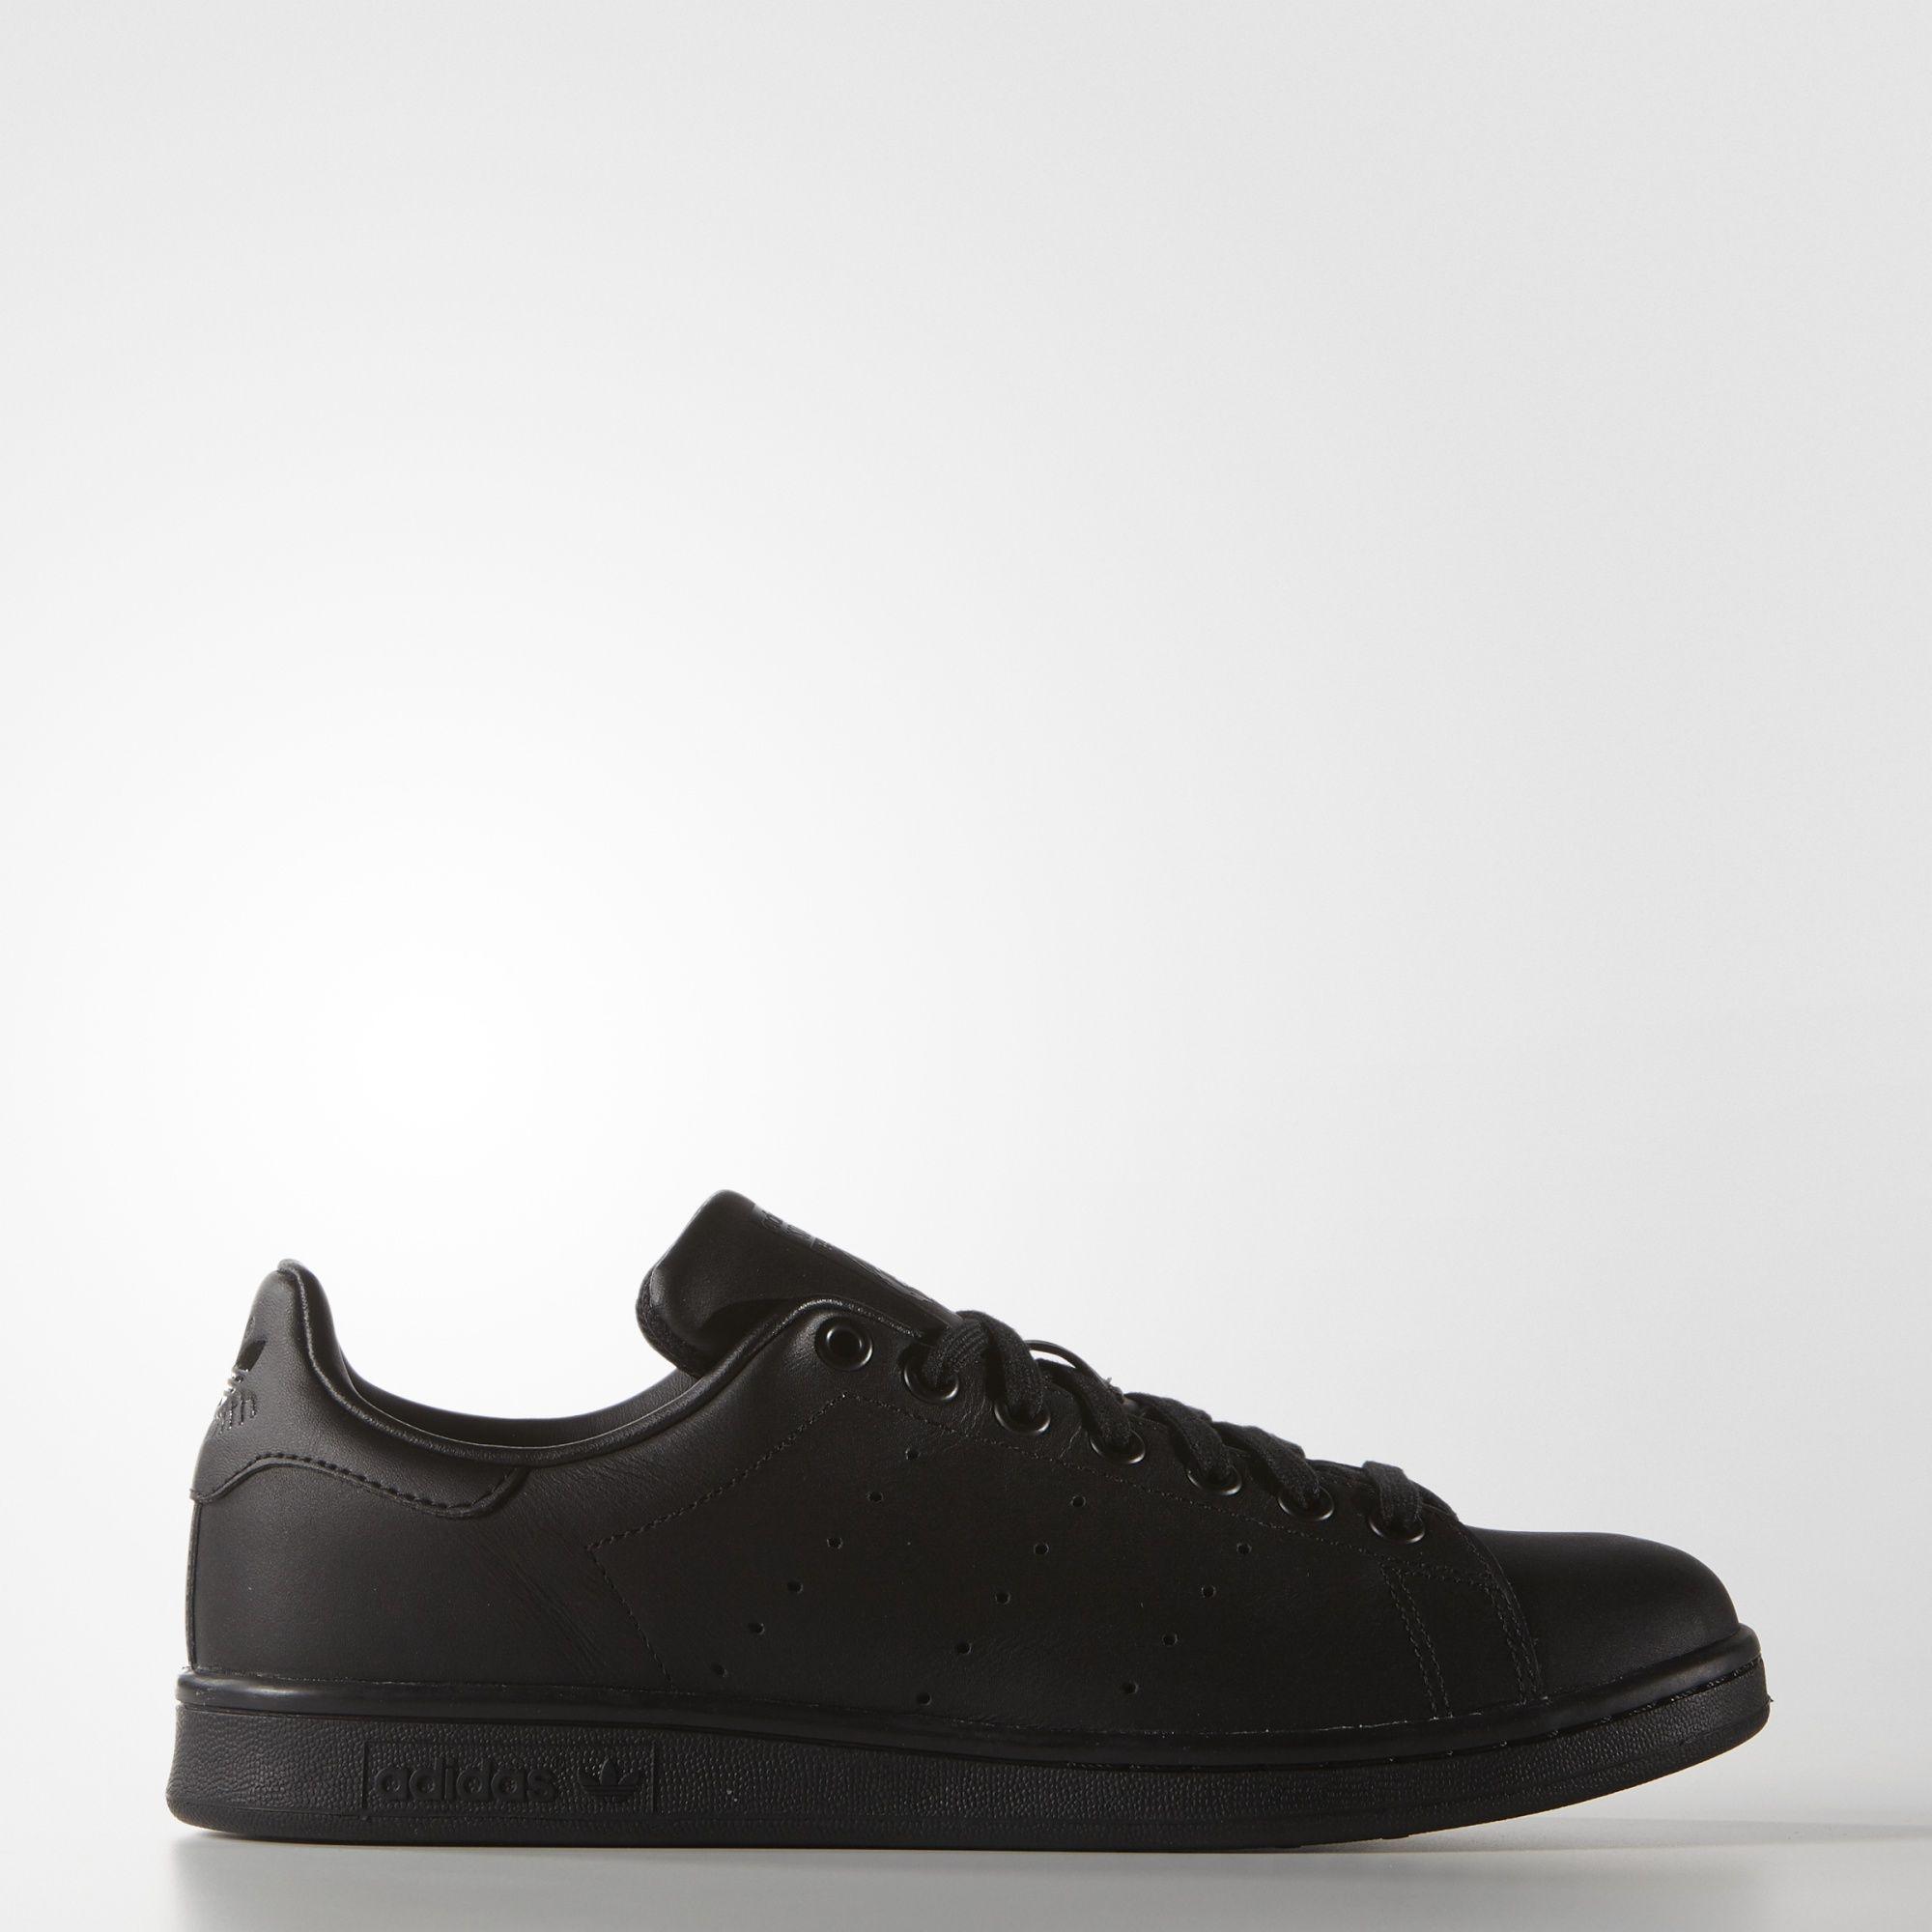 adidas Chaussure Stan chaussures Smith Wishlist Pinterest chaussures Stan db4dab